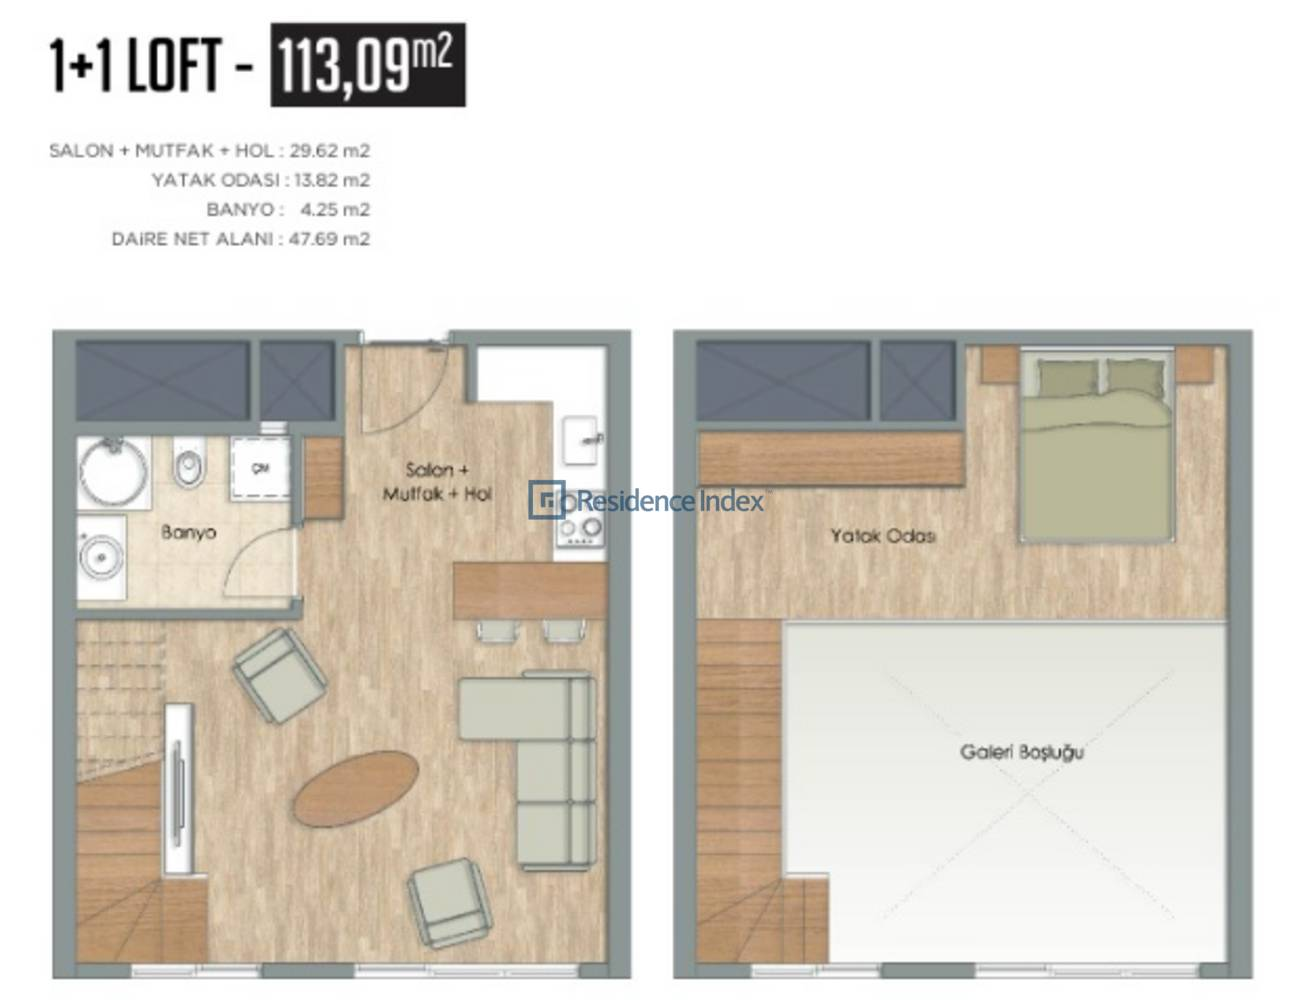 Helenium Sky Suite Loft